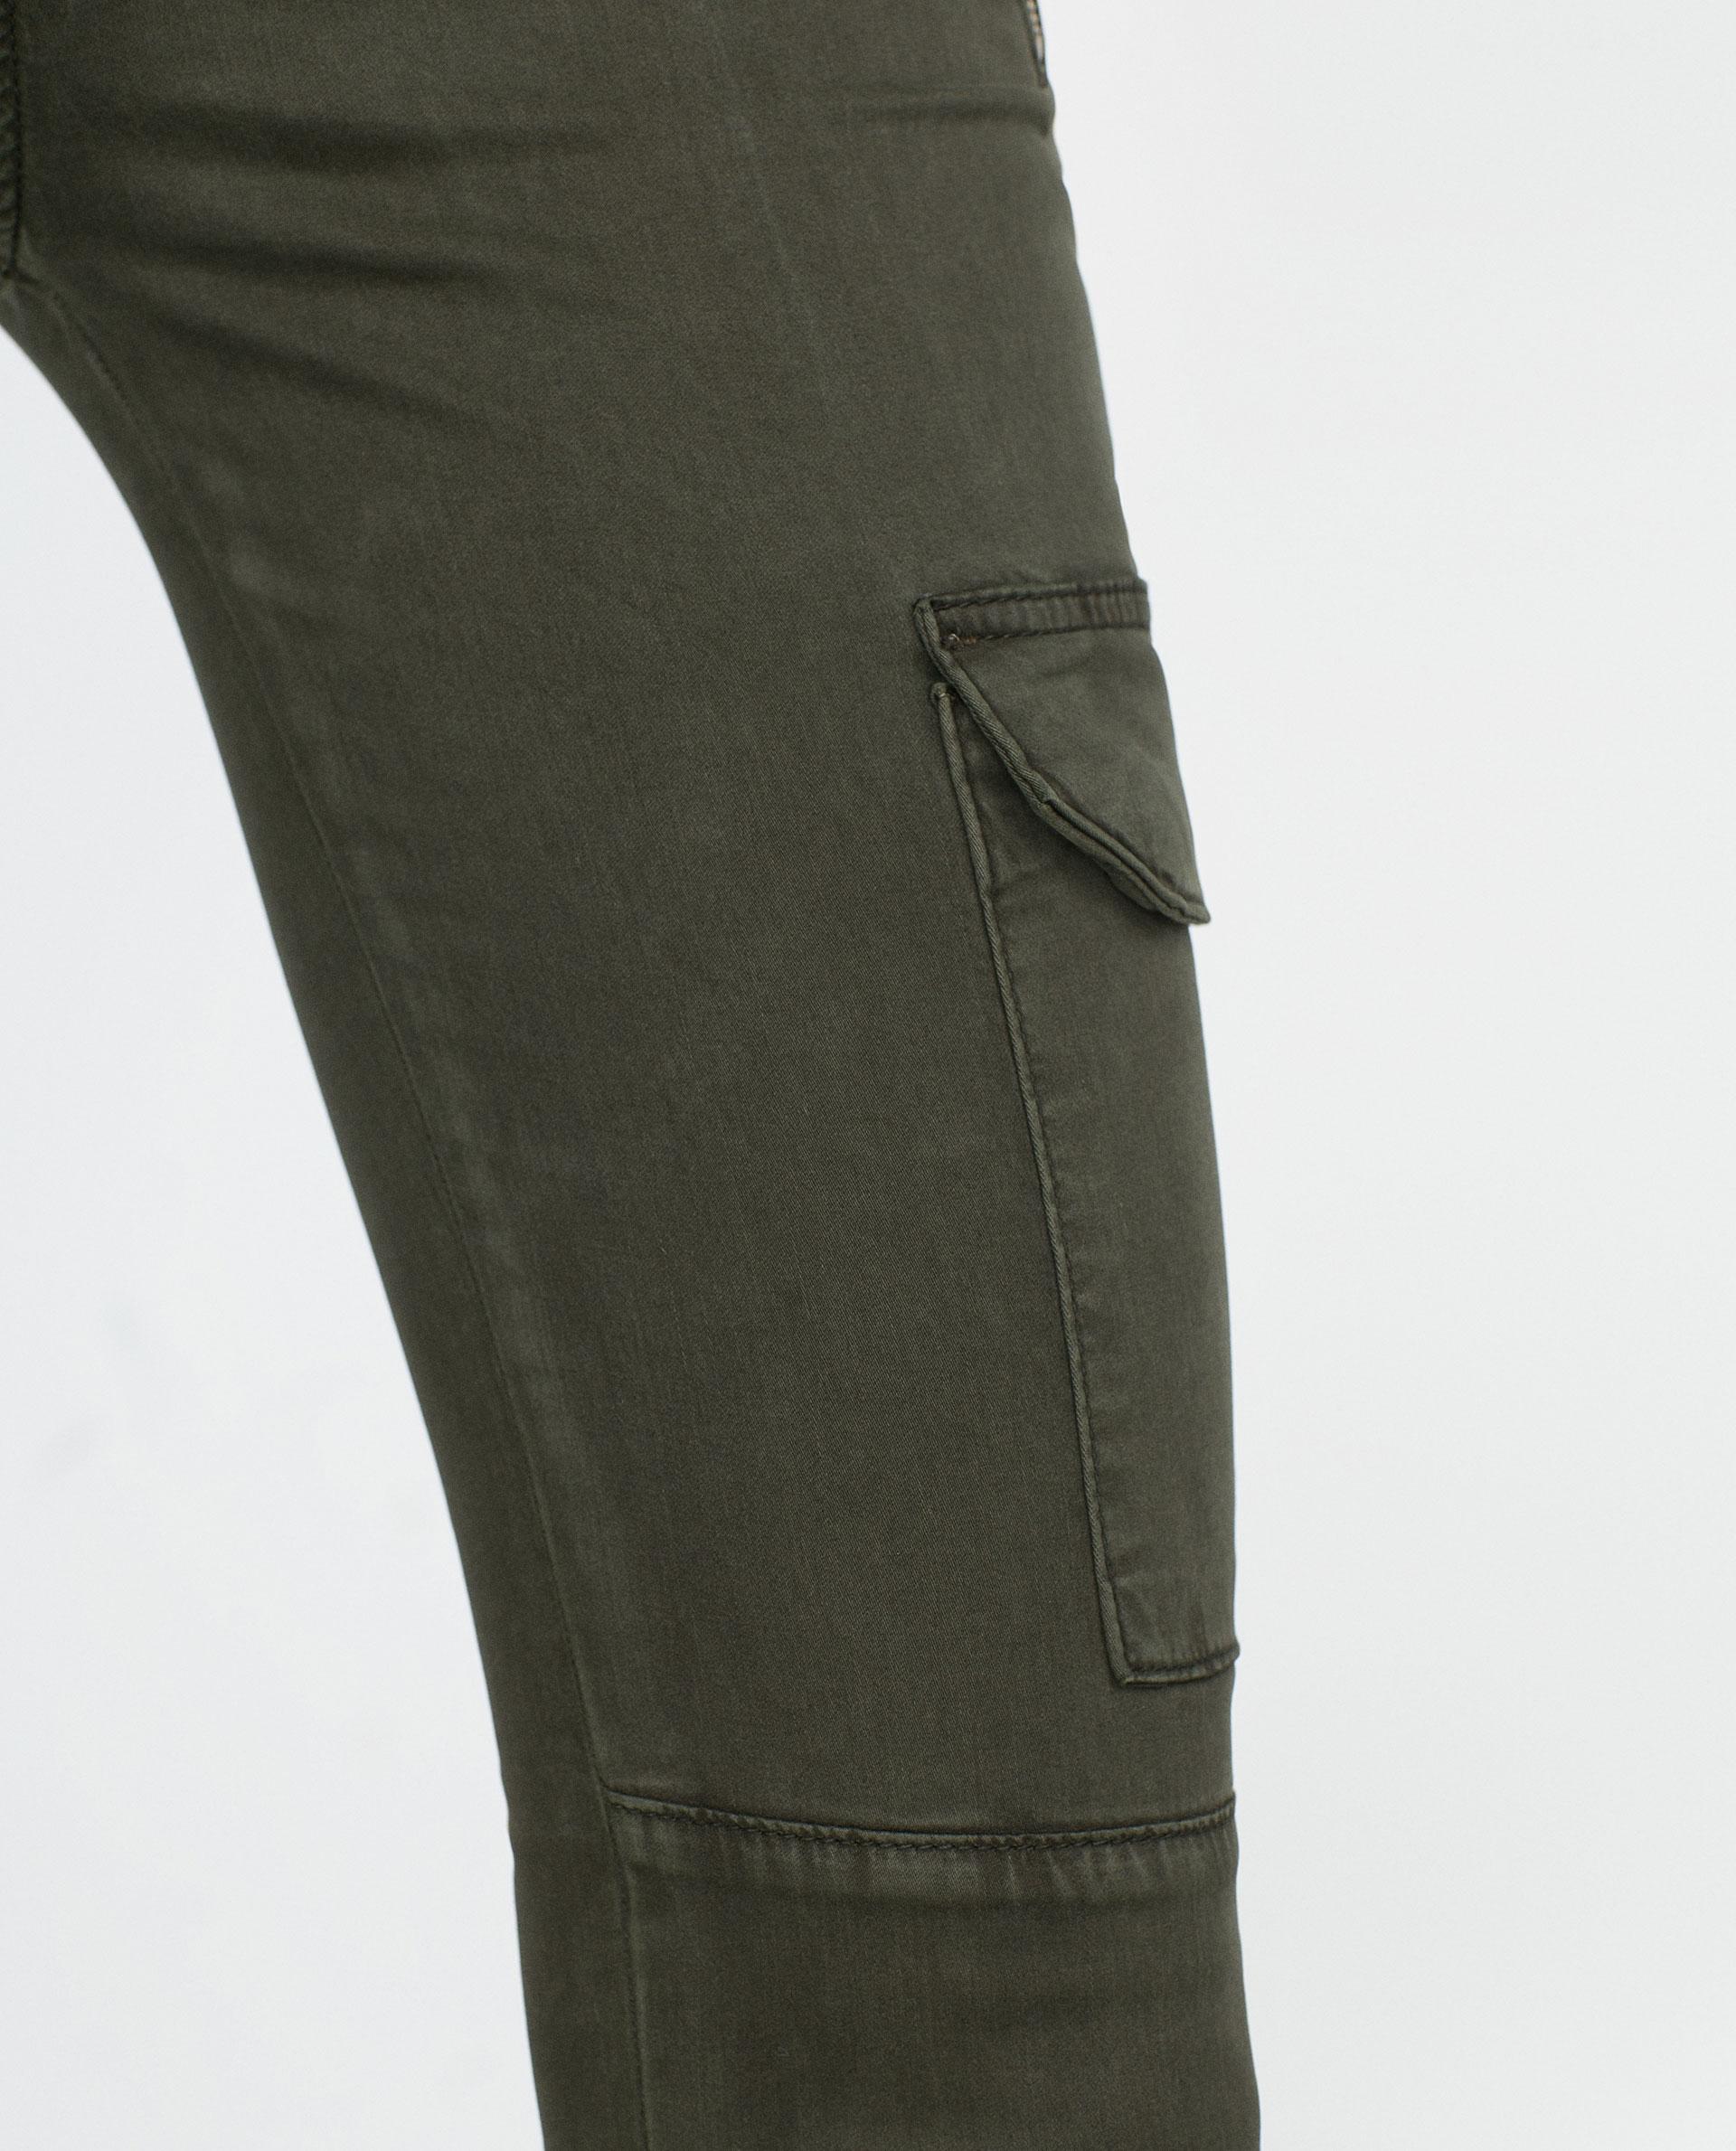 pantalones zara militar